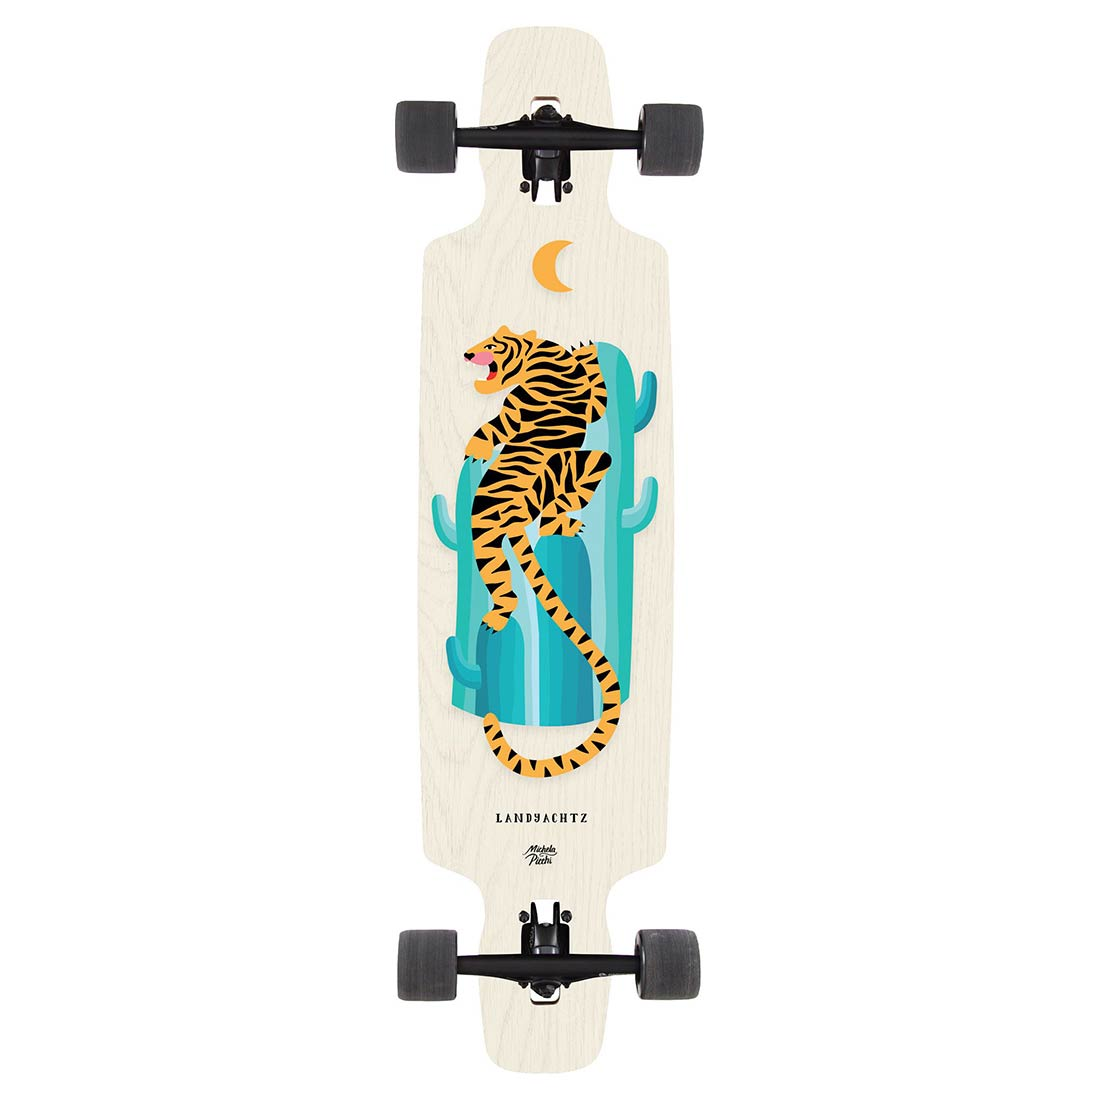 Buy Landyachtz Drop Carve Desert Tiger Complete Canada Online Sales Vancouver Pickup